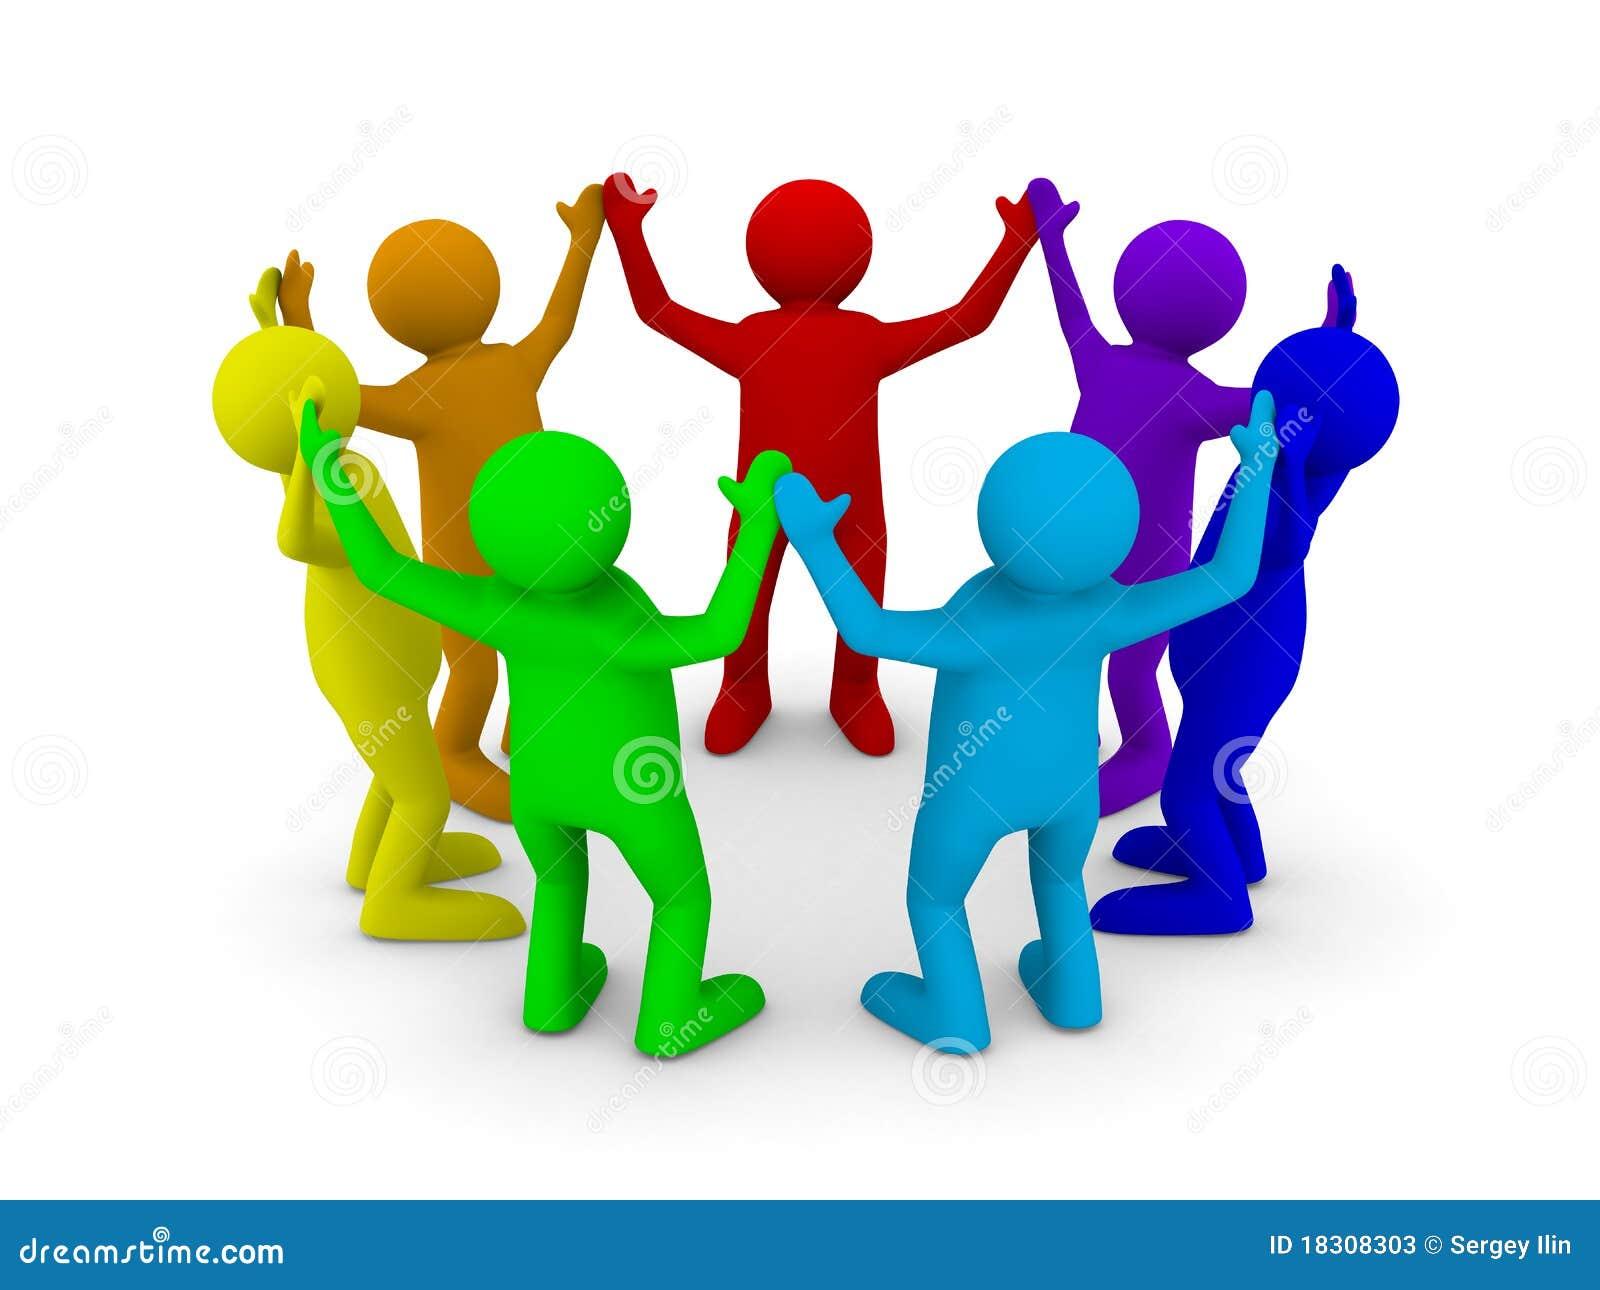 Conceptual image of teamwork stock photos image 18308303